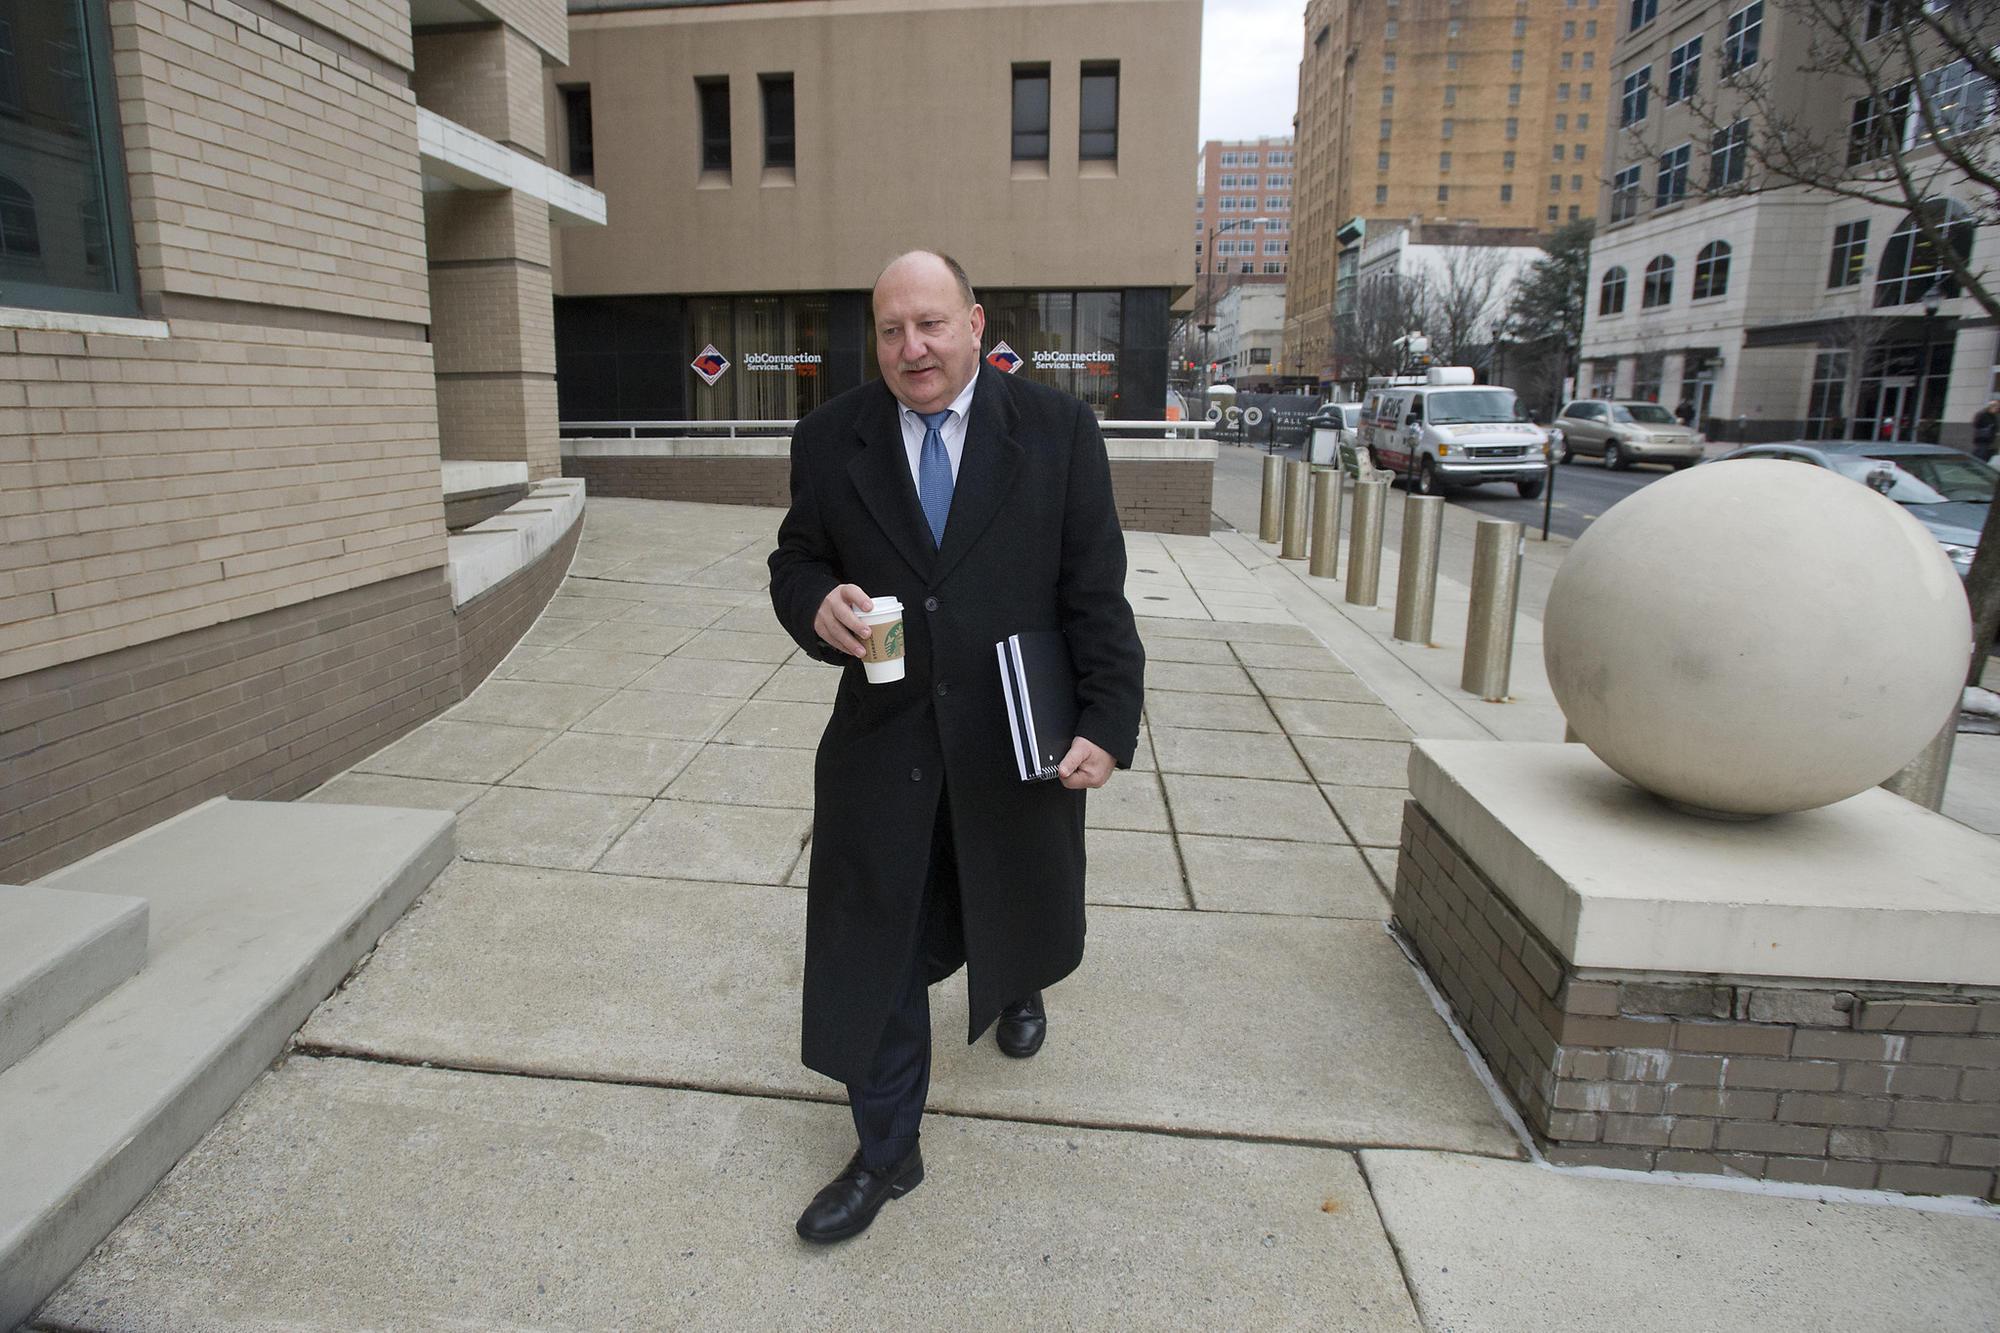 RECAP: Allentown Mayor Ed Pawlowski\'s 6-week trial, boiled down ...